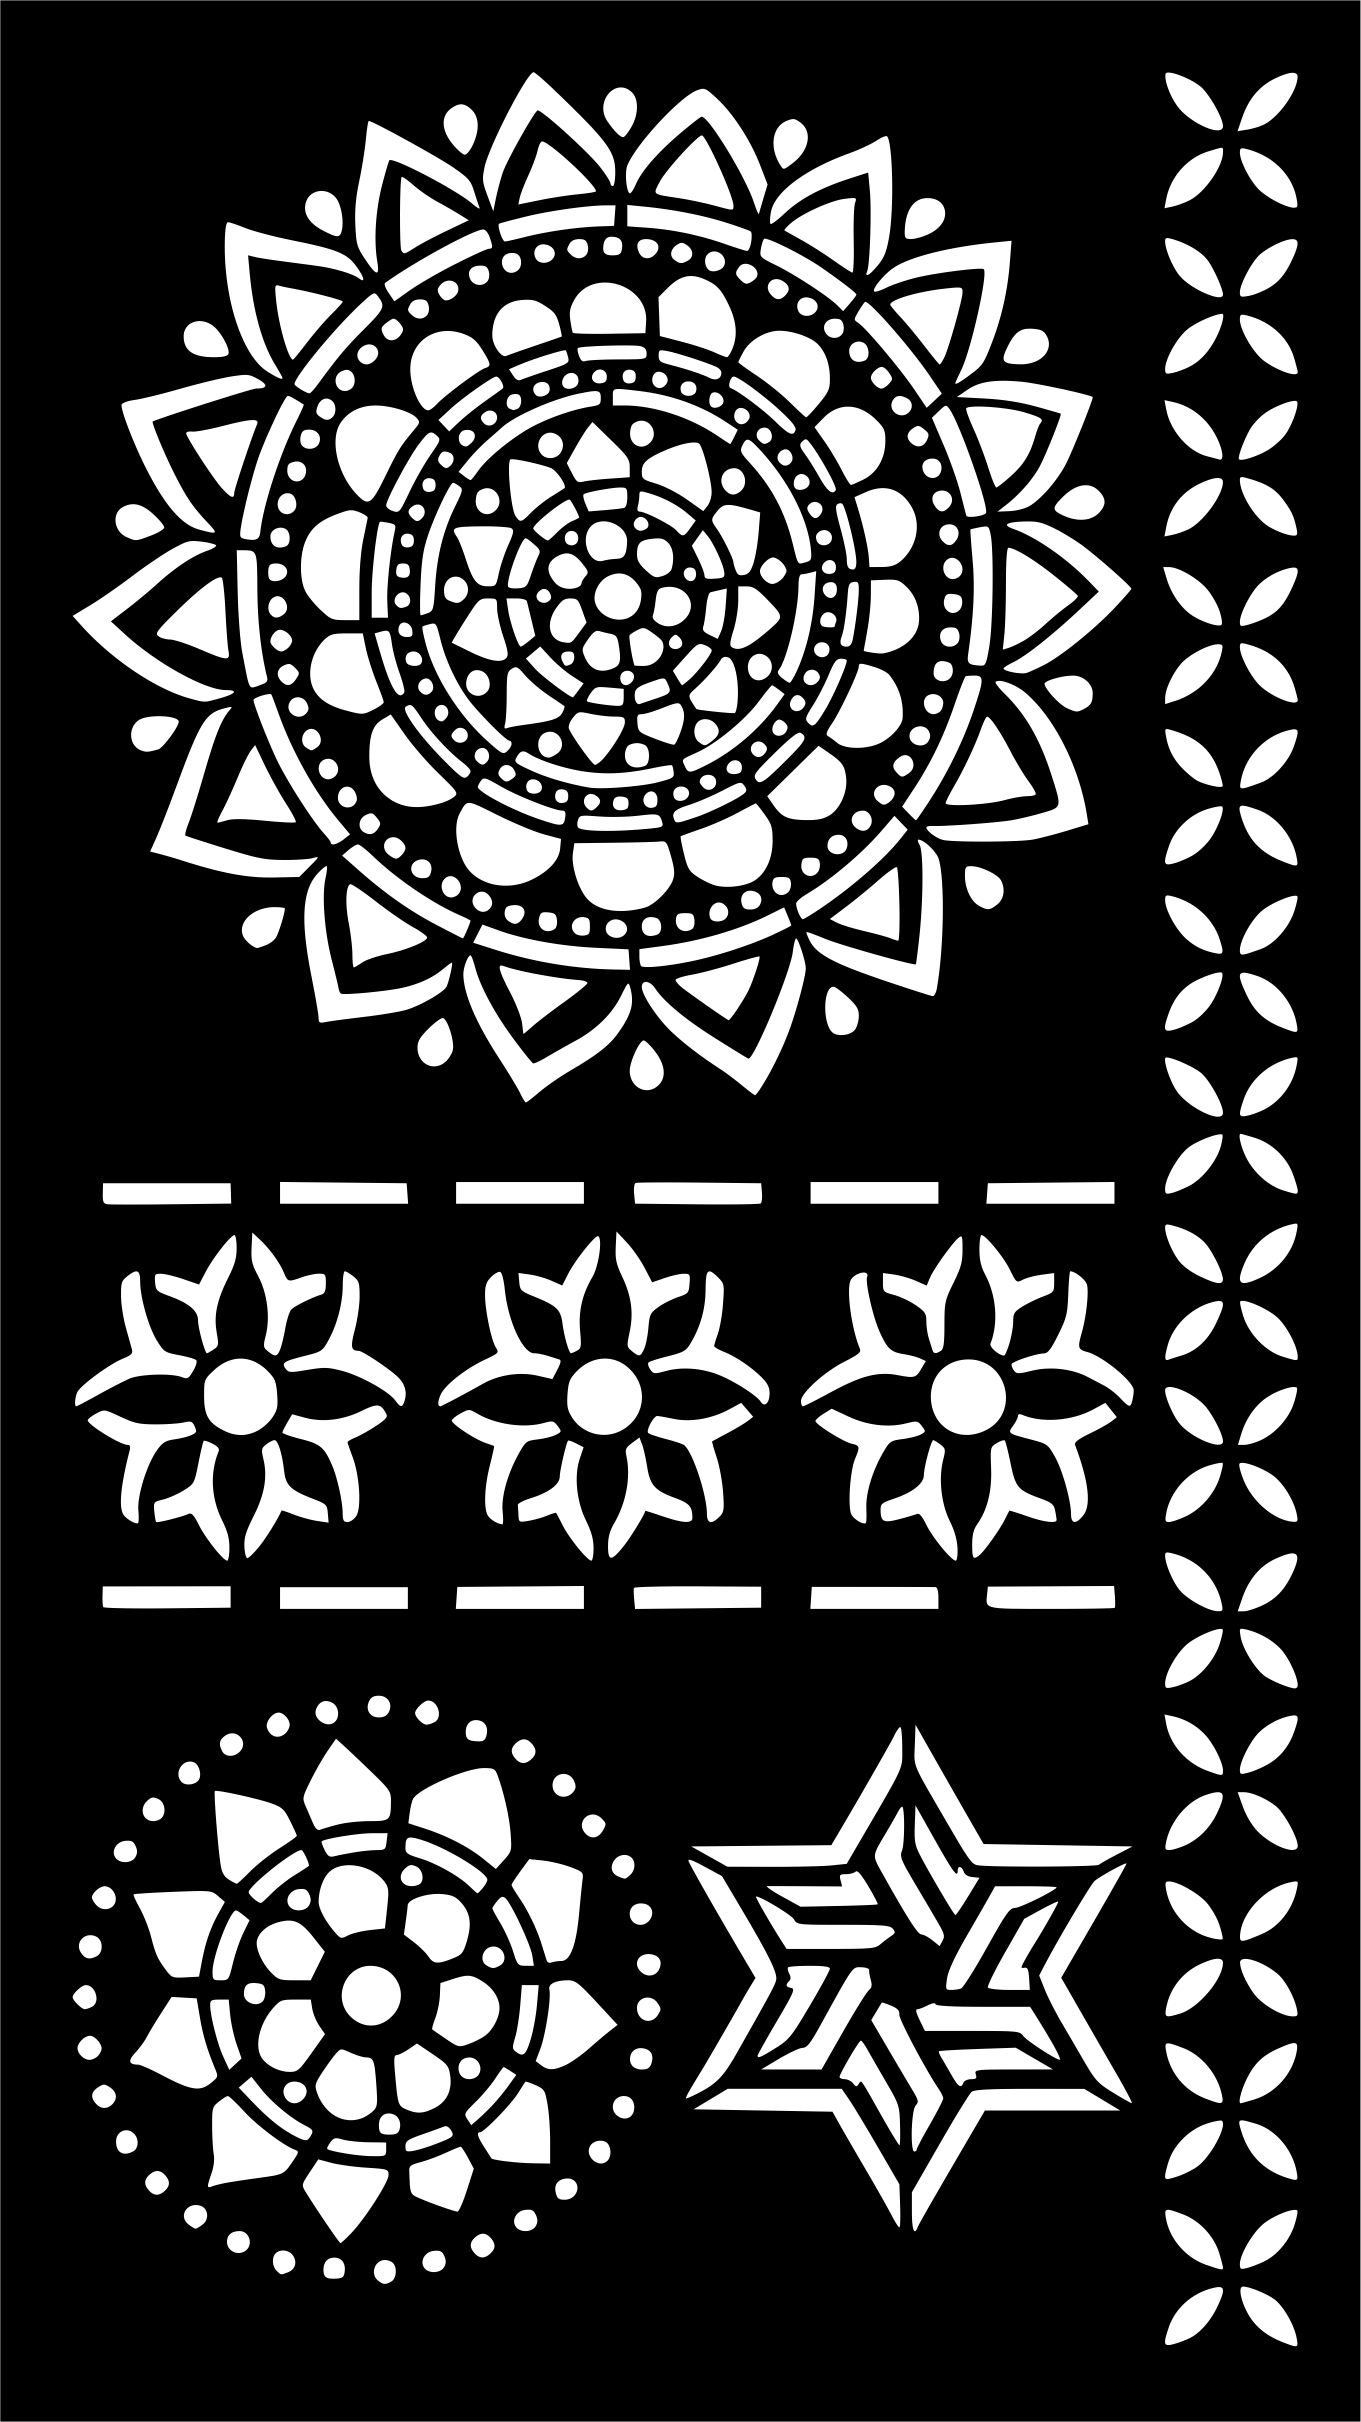 Henna Temporary Tattoo Body Art Stencil Temporarytattooremoval Henna Stencils Henna Tattoo Stencils Tattoo Stencils